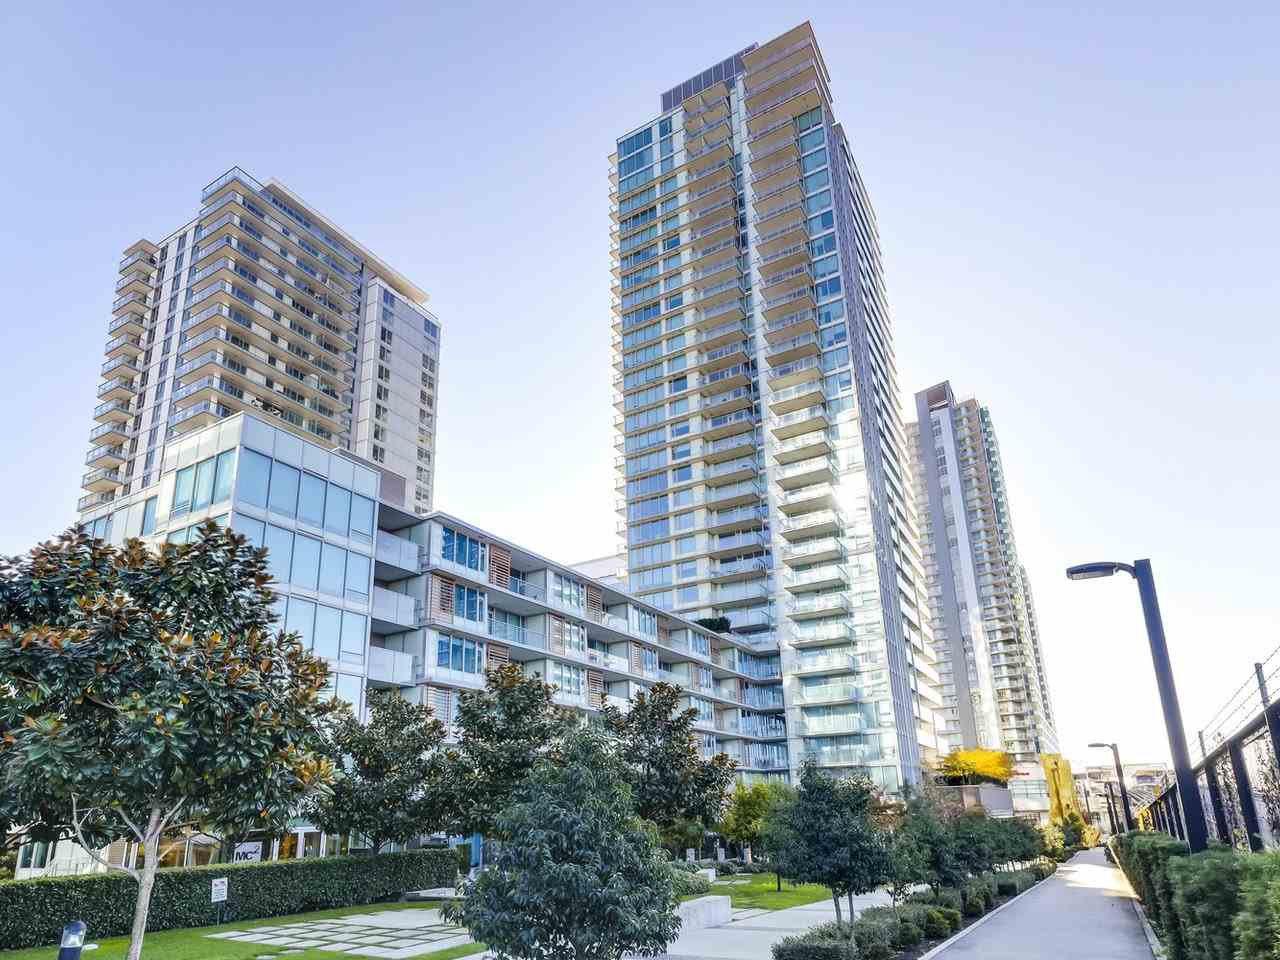 Main Photo: 2007 8131 NUNAVUT Lane in Vancouver: Marpole Condo for sale (Vancouver West)  : MLS®# R2516693